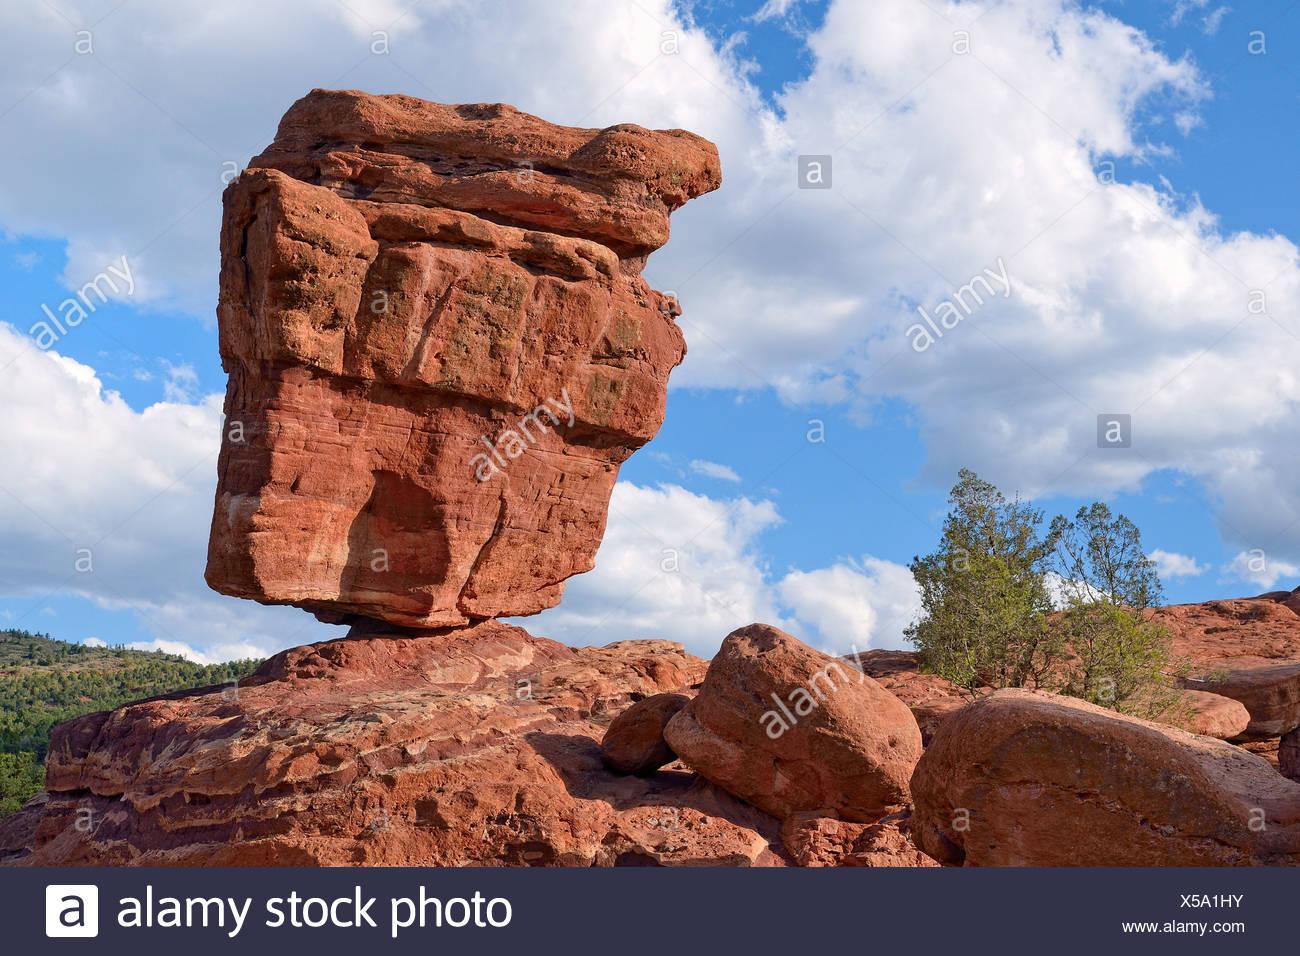 Balanced Rock, Garden of the Gods, red sandstone rocks